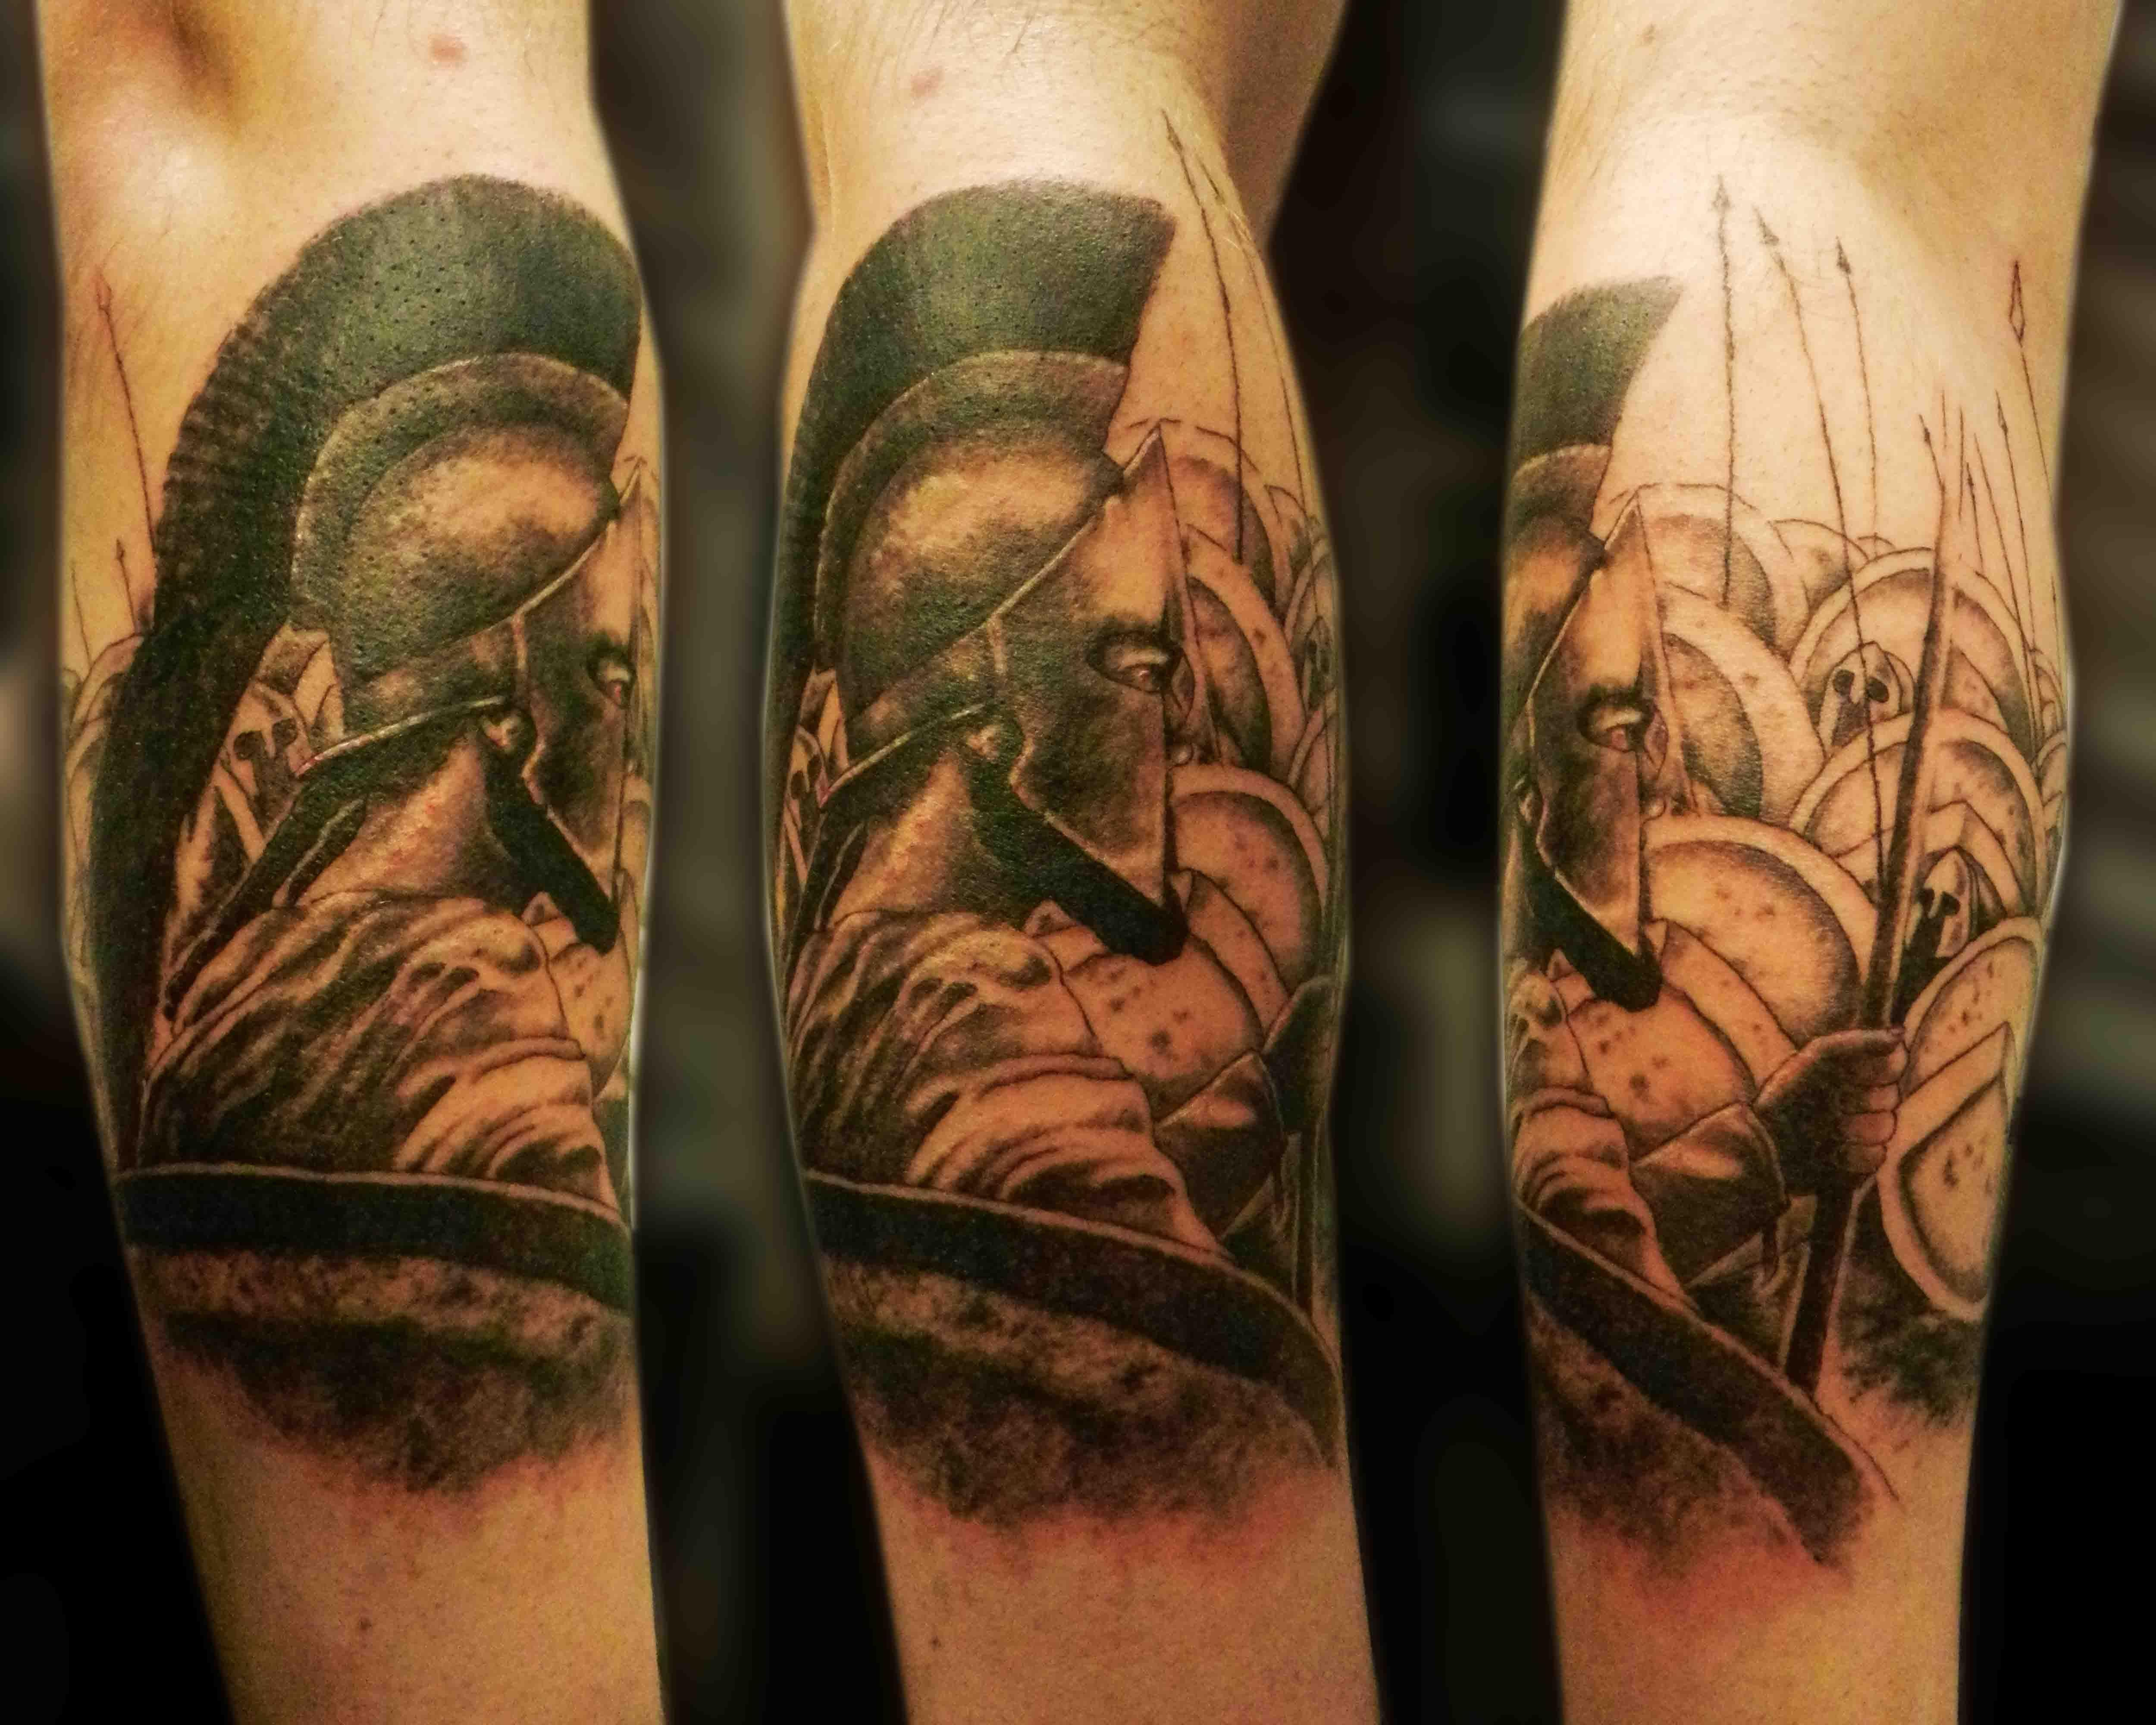 greek spartan tattoo designs greek spartan tattoos pinterest spartan tattoo tattoo. Black Bedroom Furniture Sets. Home Design Ideas